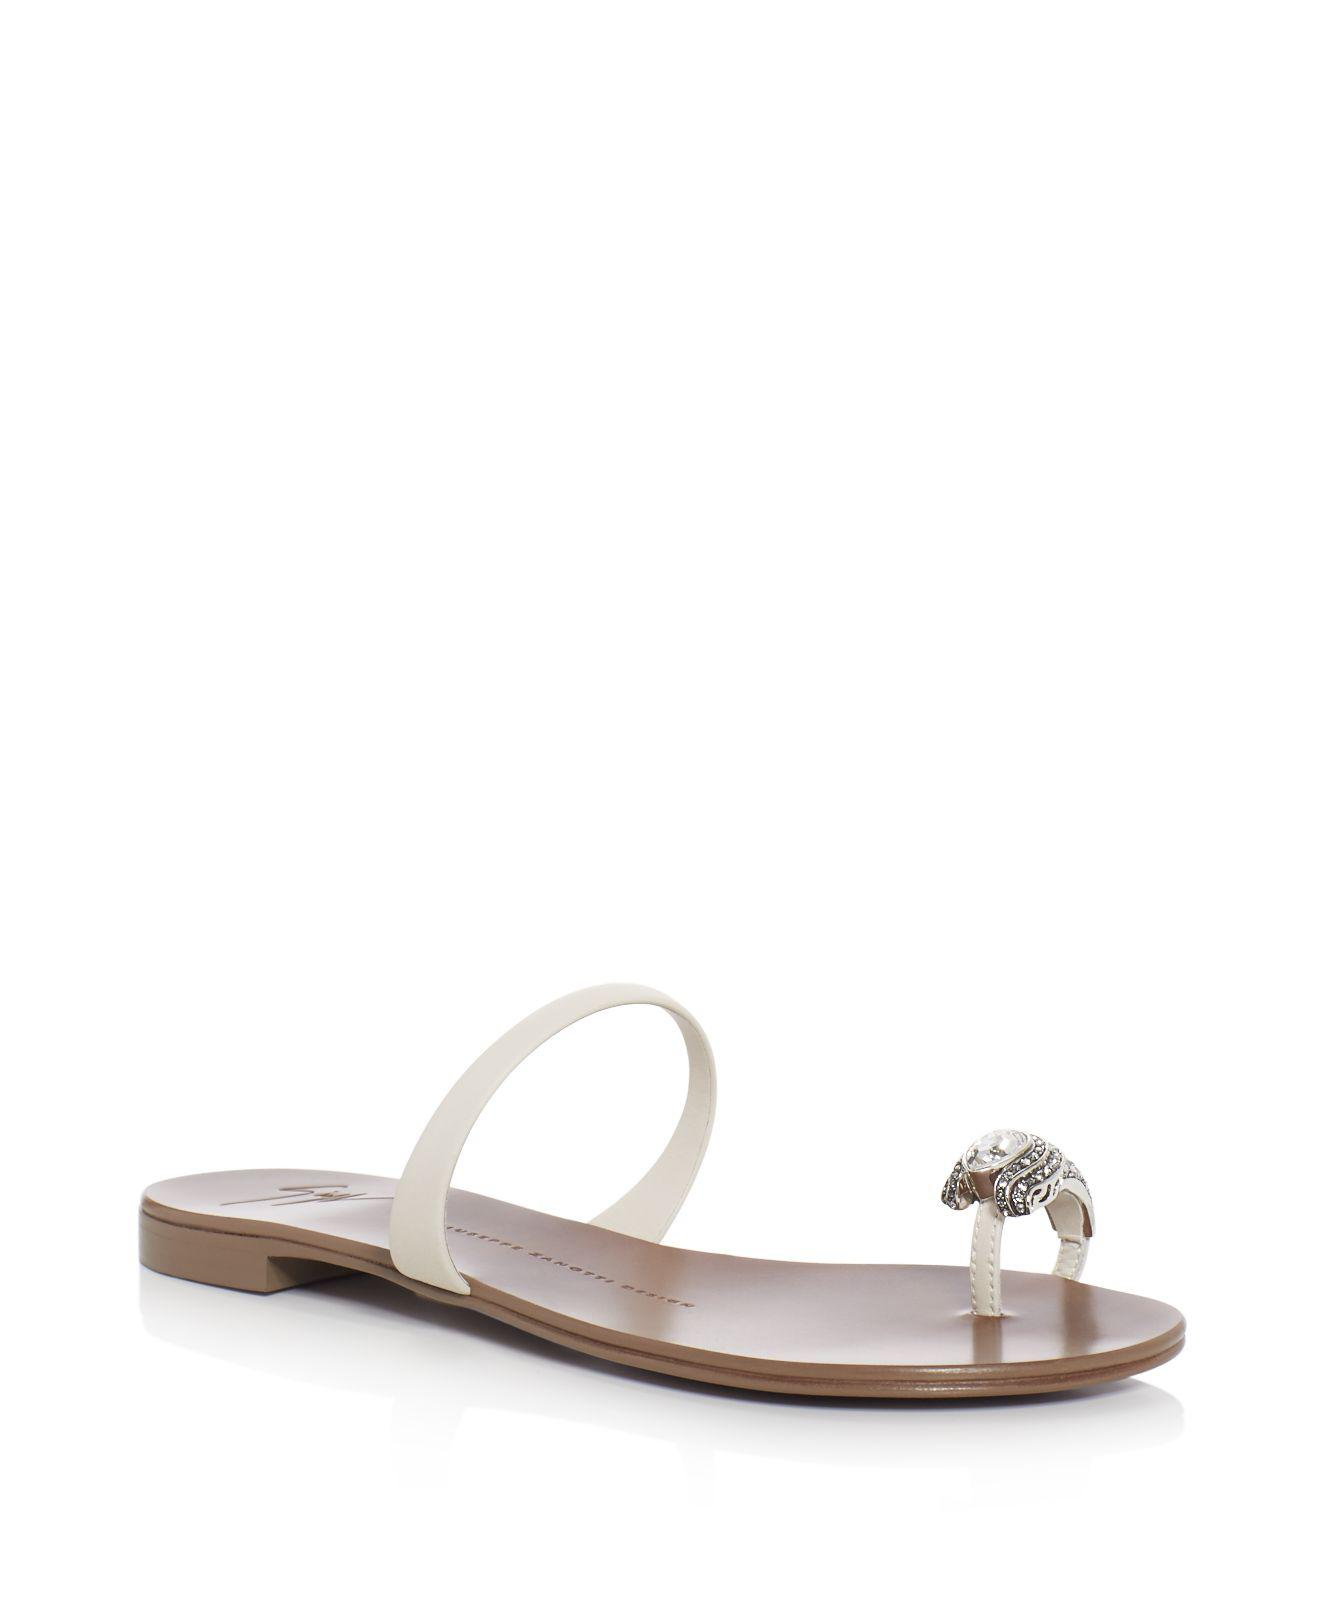 Giuseppe Zanotti Womens Toe Ring Slides